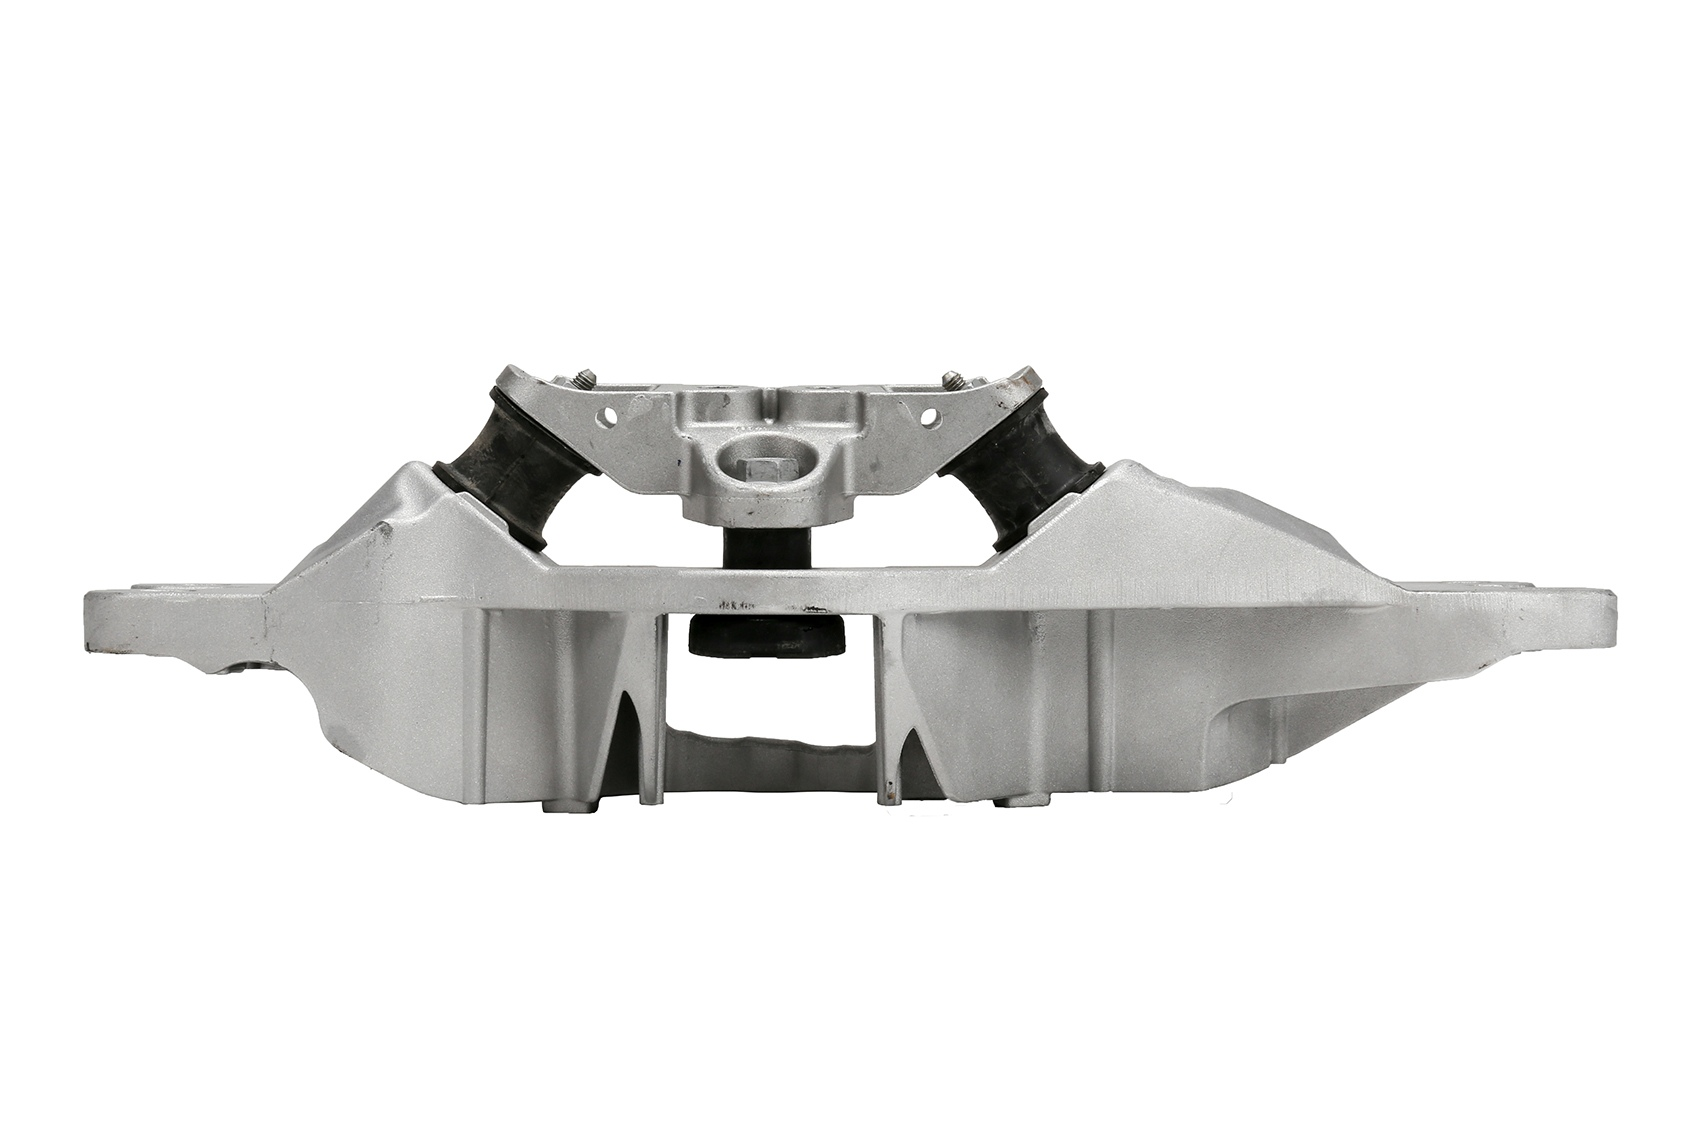 ACDELCO GM ORIGINAL EQUIPMENT - Transmission Mount - DCB 84238546